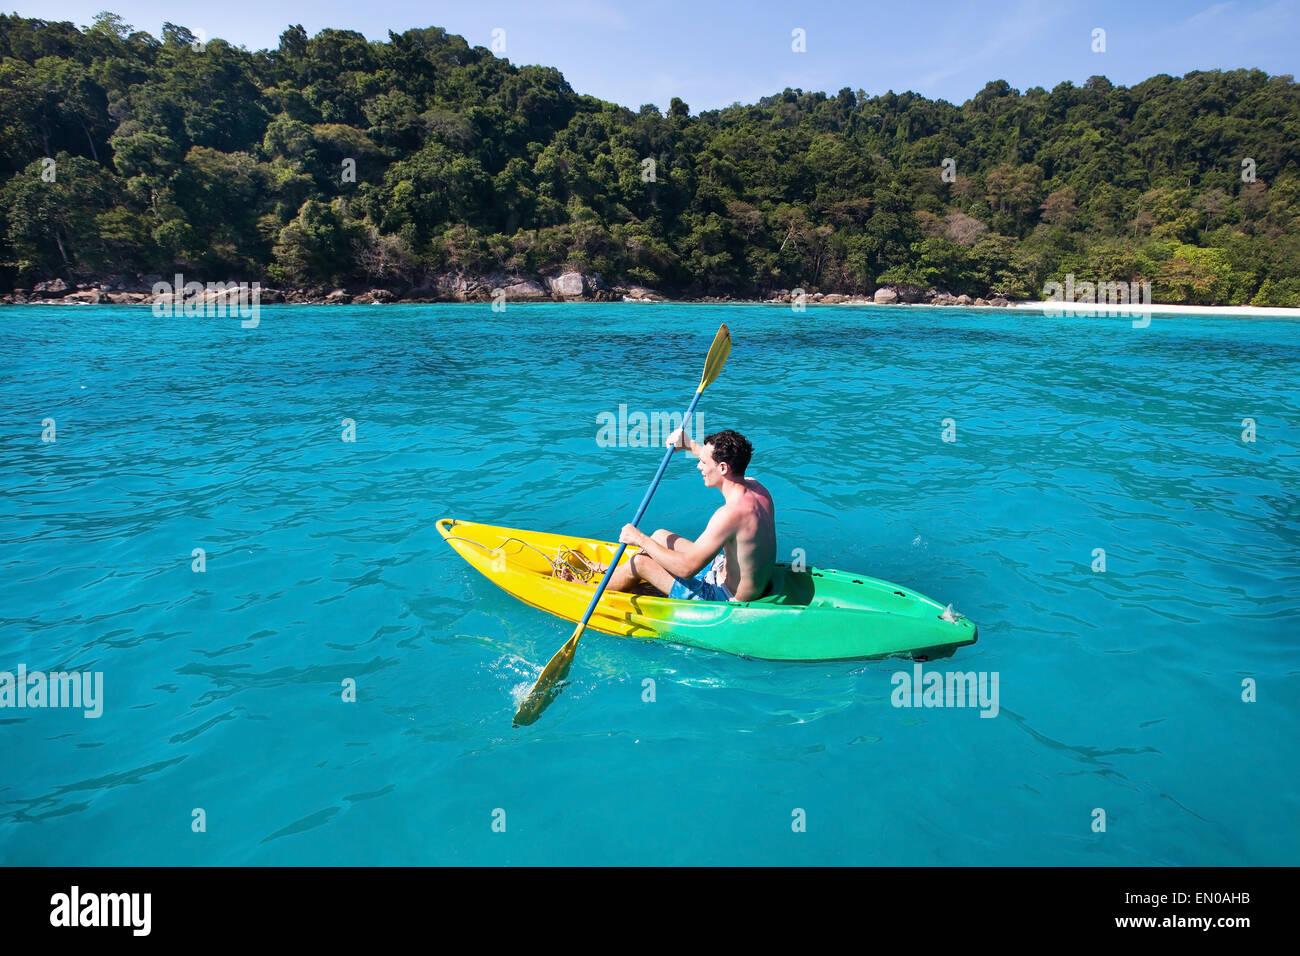 Joven Hombre caucásico en kayak cerca de la isla paraíso de agua turquesa Imagen De Stock